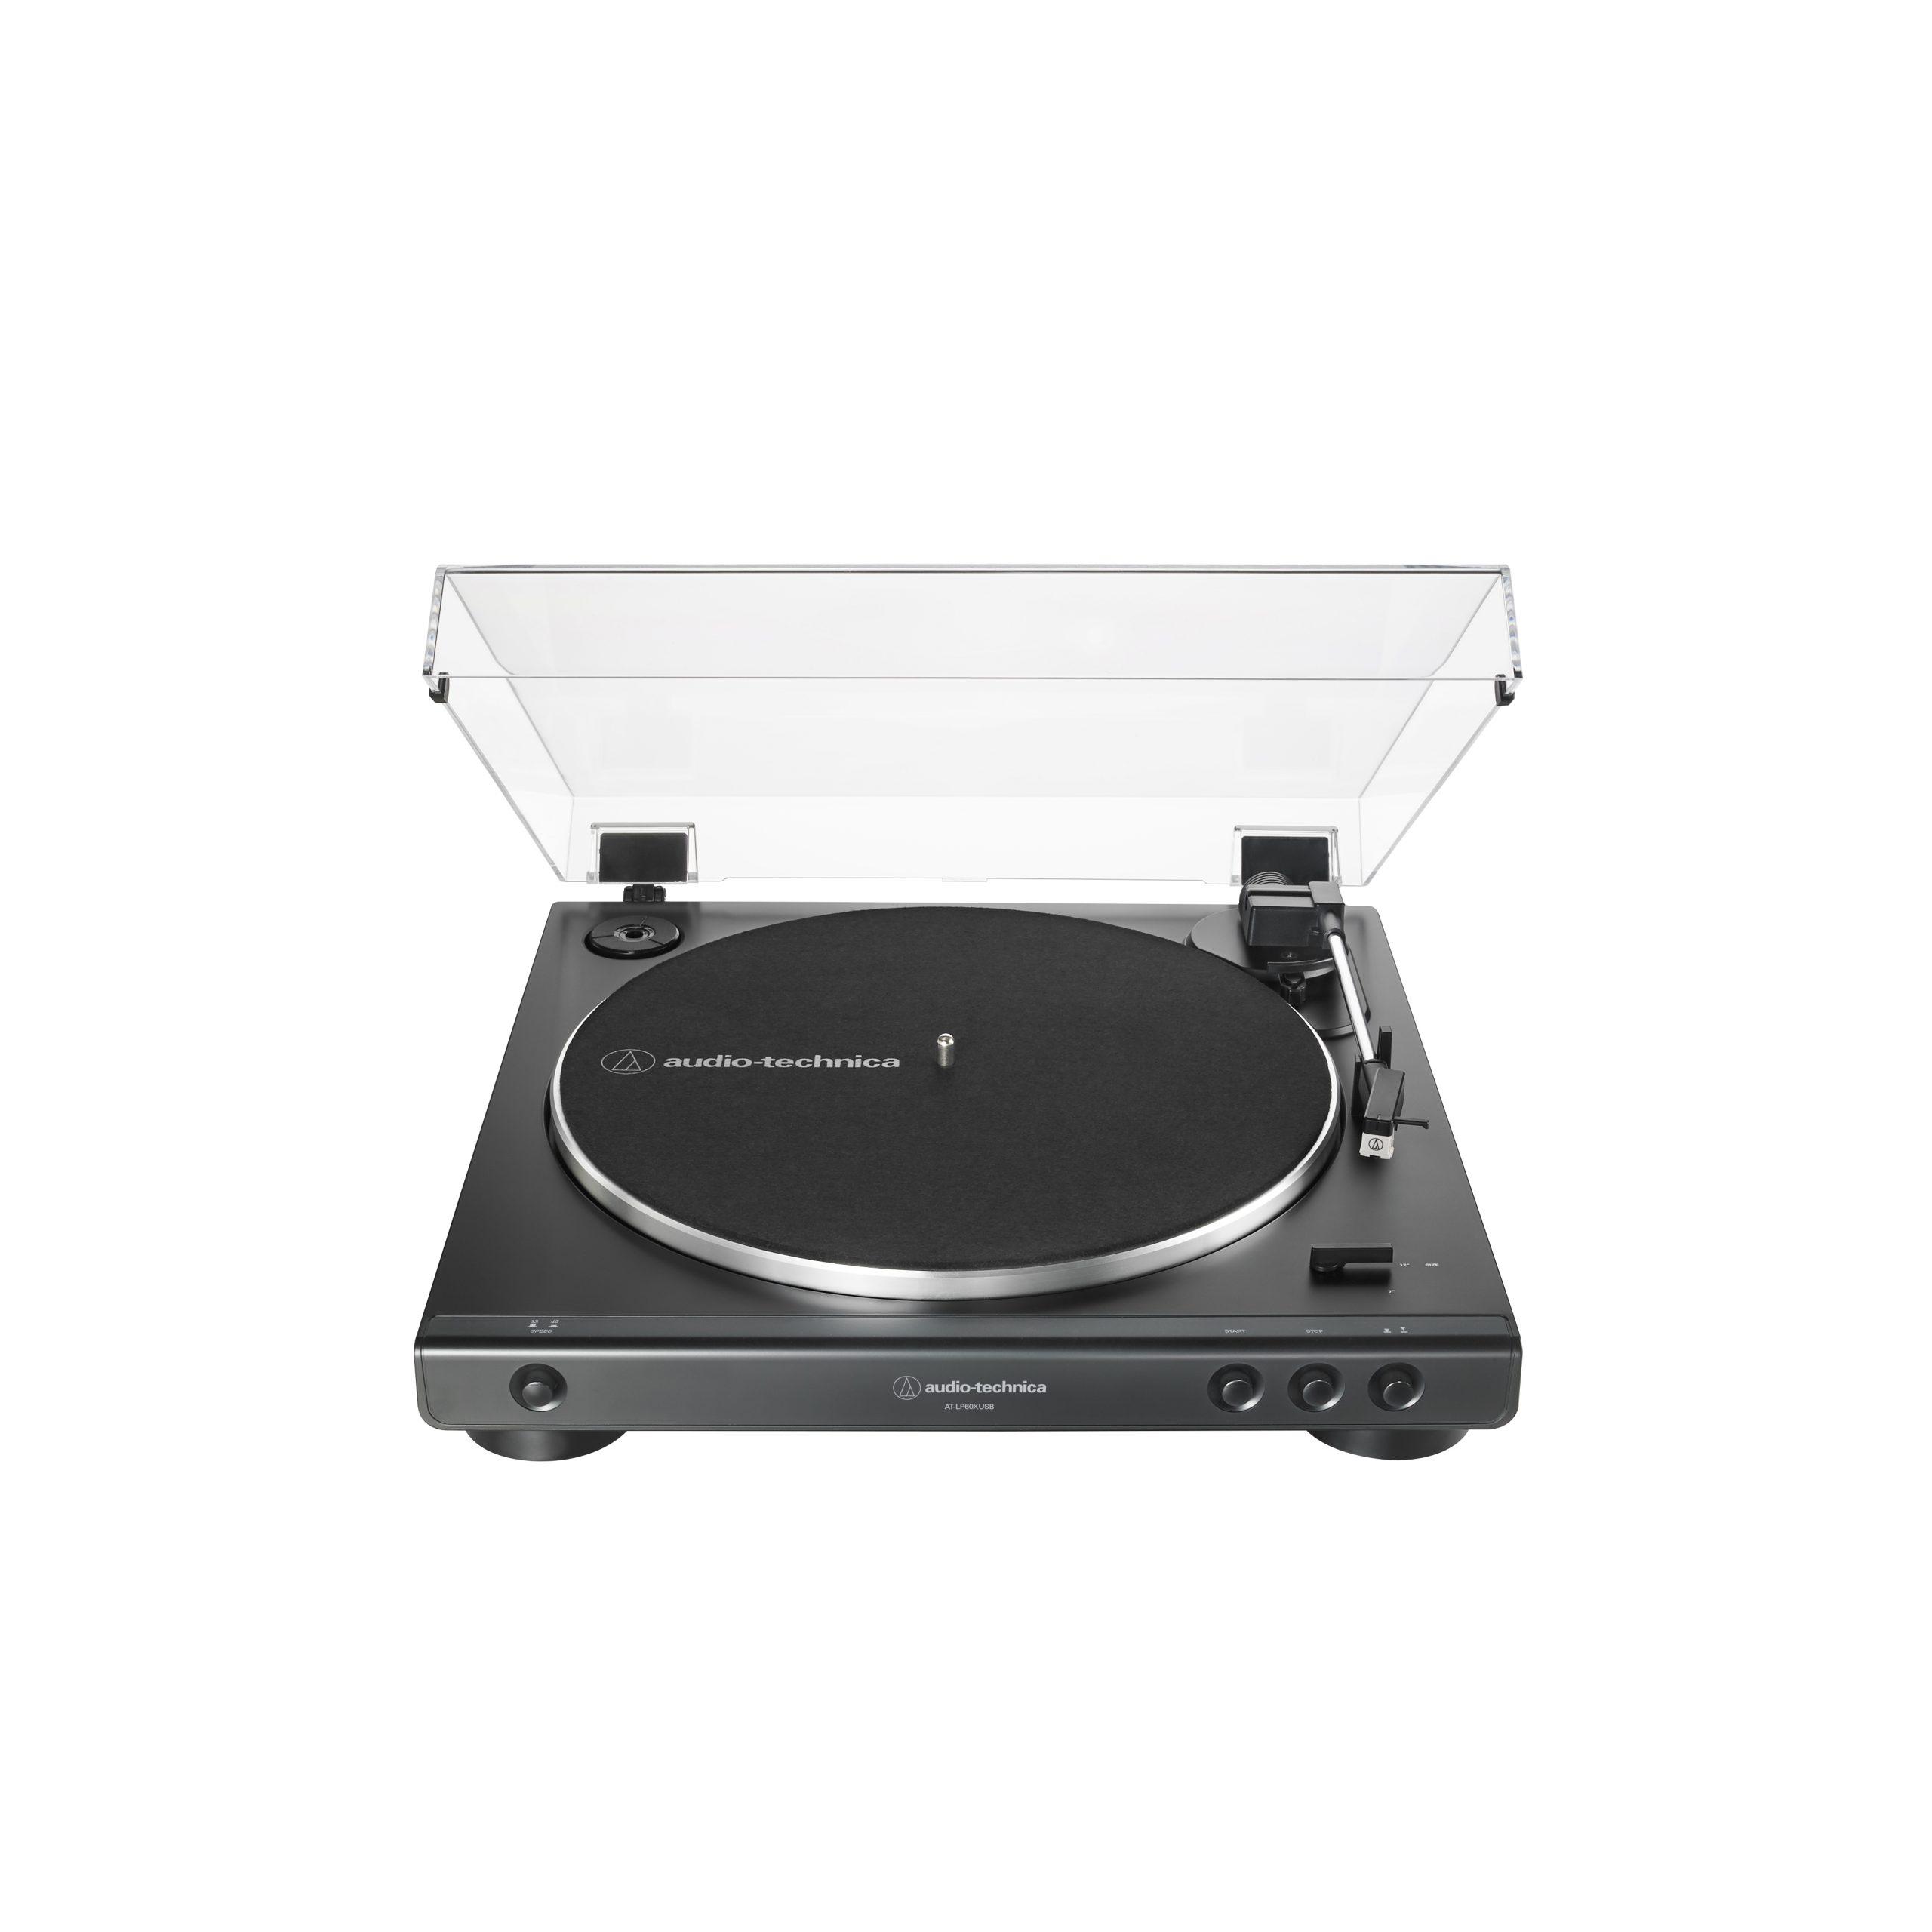 Singapore Turntable, Audio Technica AT-LP60X, Vinyl Player, USB Turntable